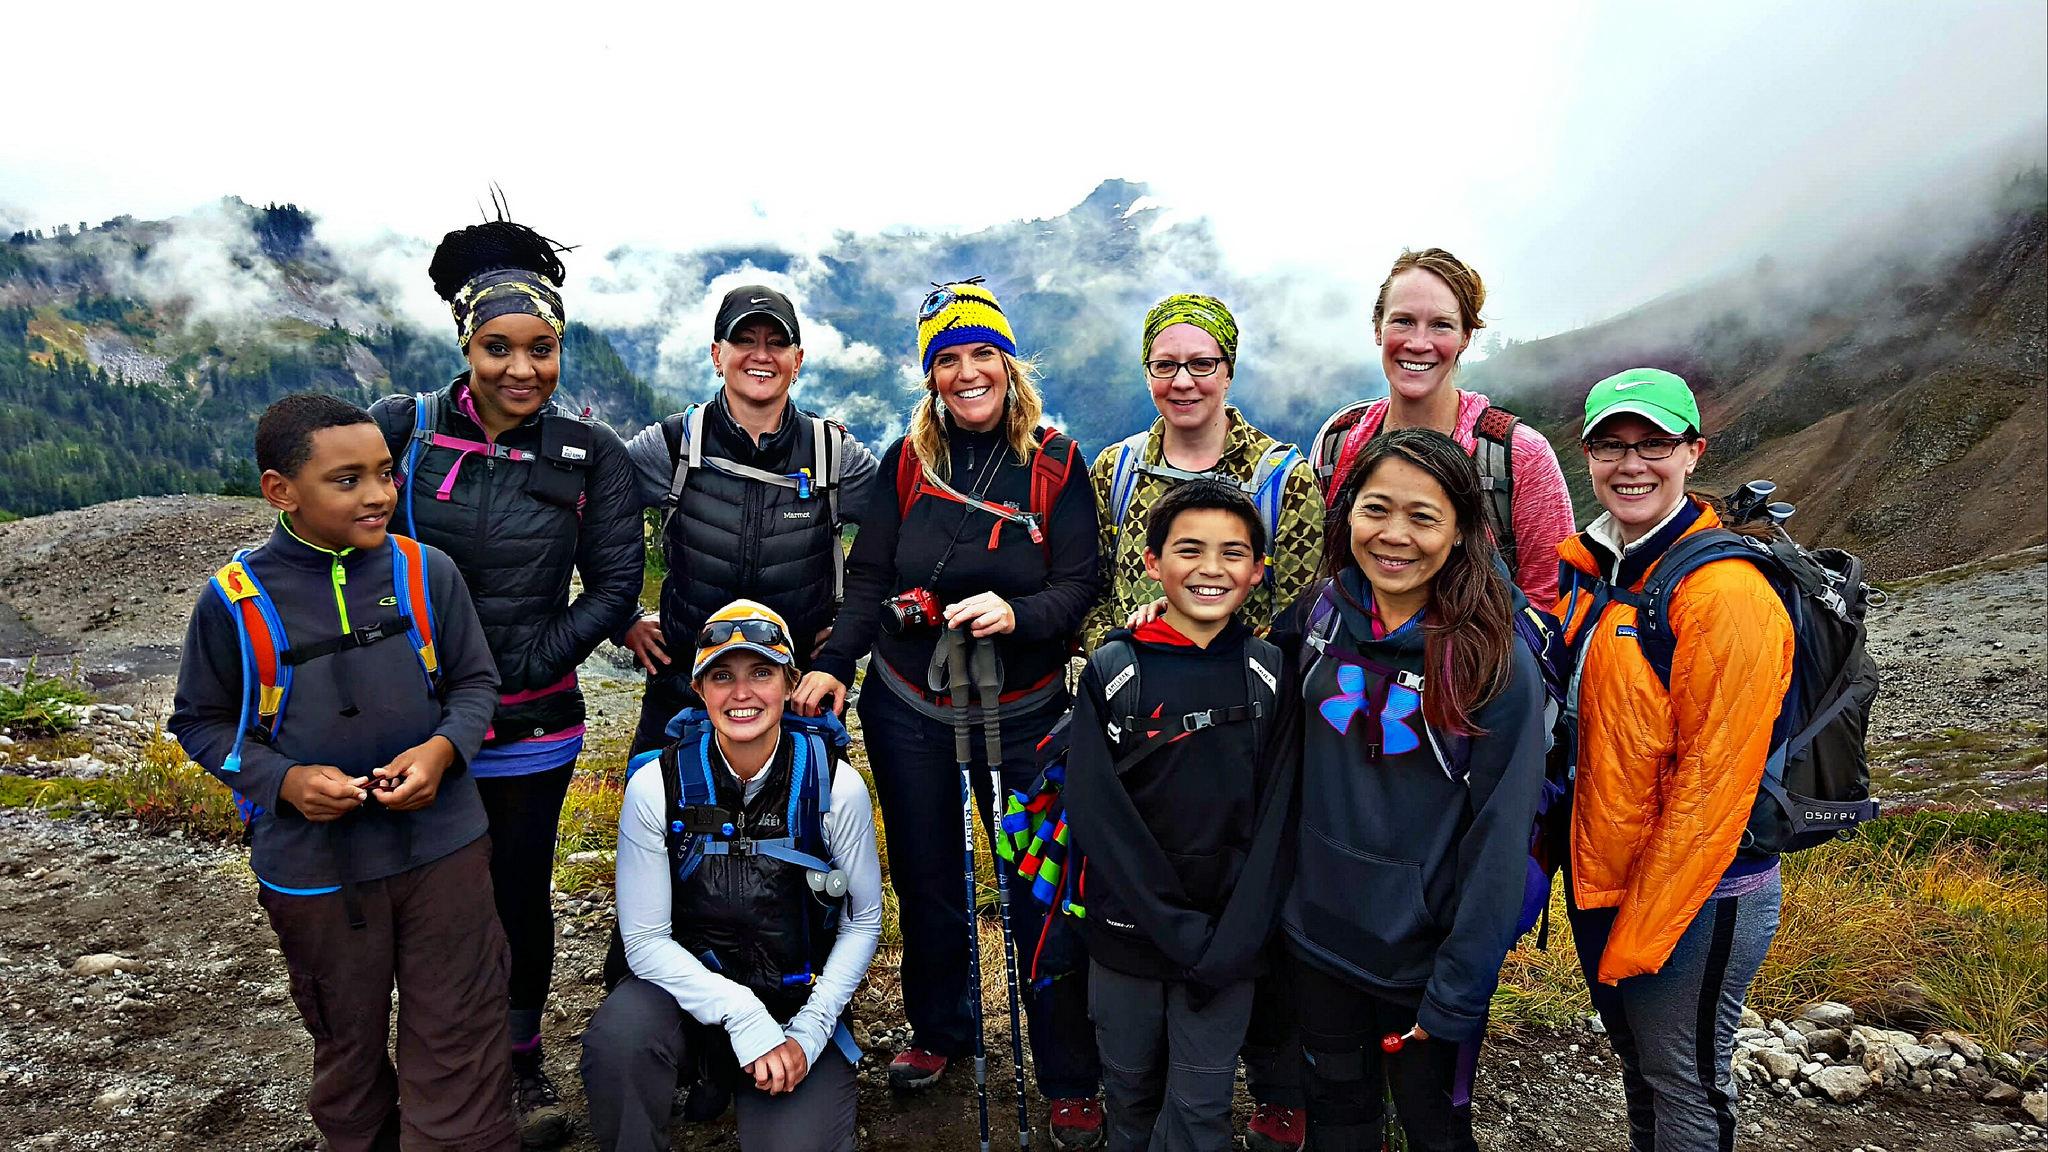 Trail Family by Kara Hollenbeck